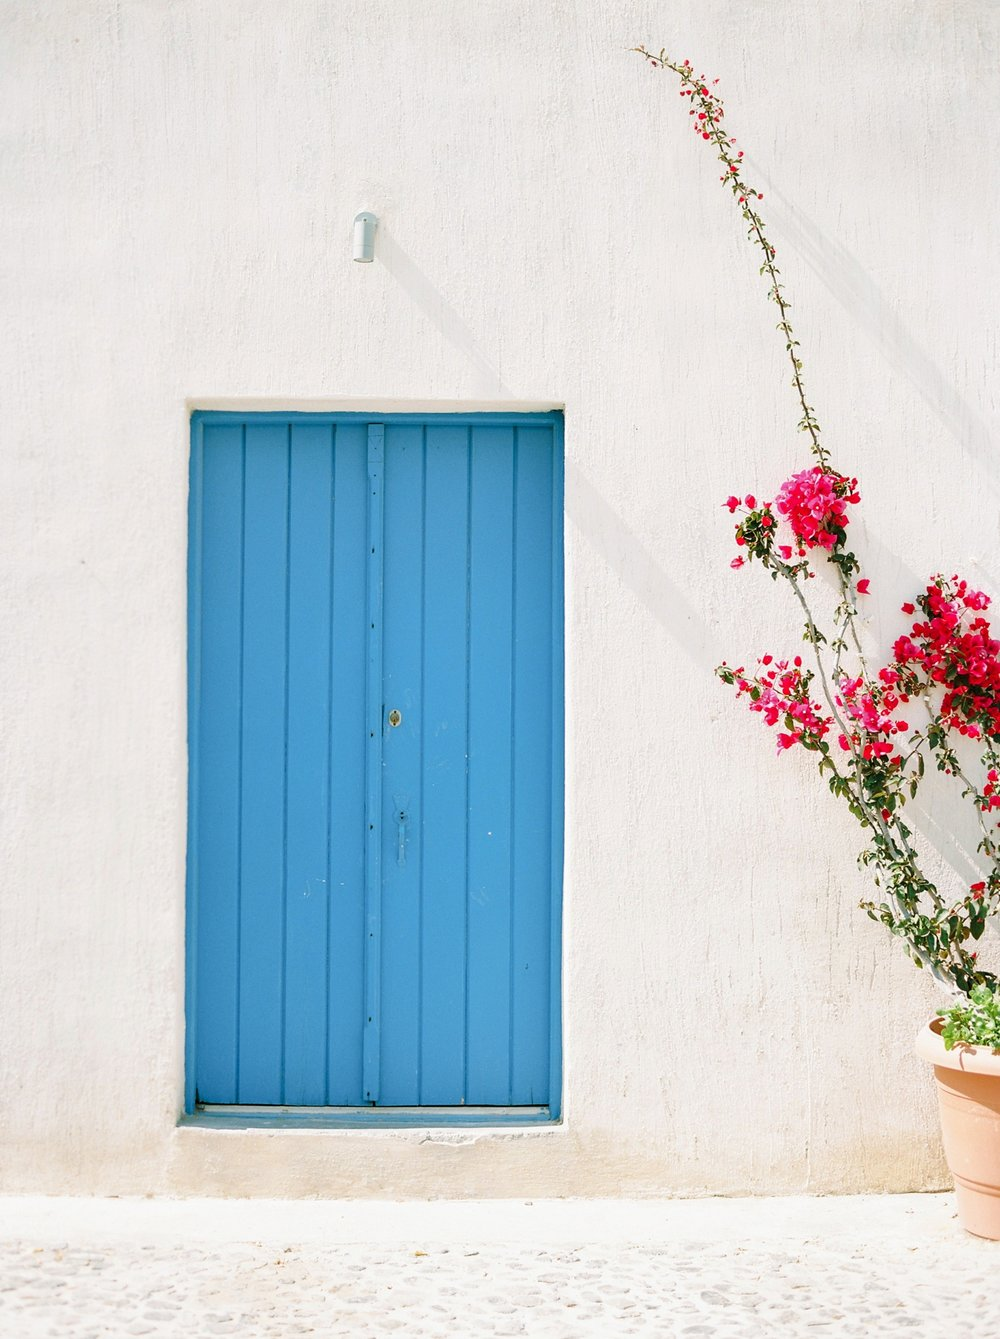 fine art film travel prints | art print shop | photographic prints for sale | santorini greece wedding photographers | Justine Milton Photography